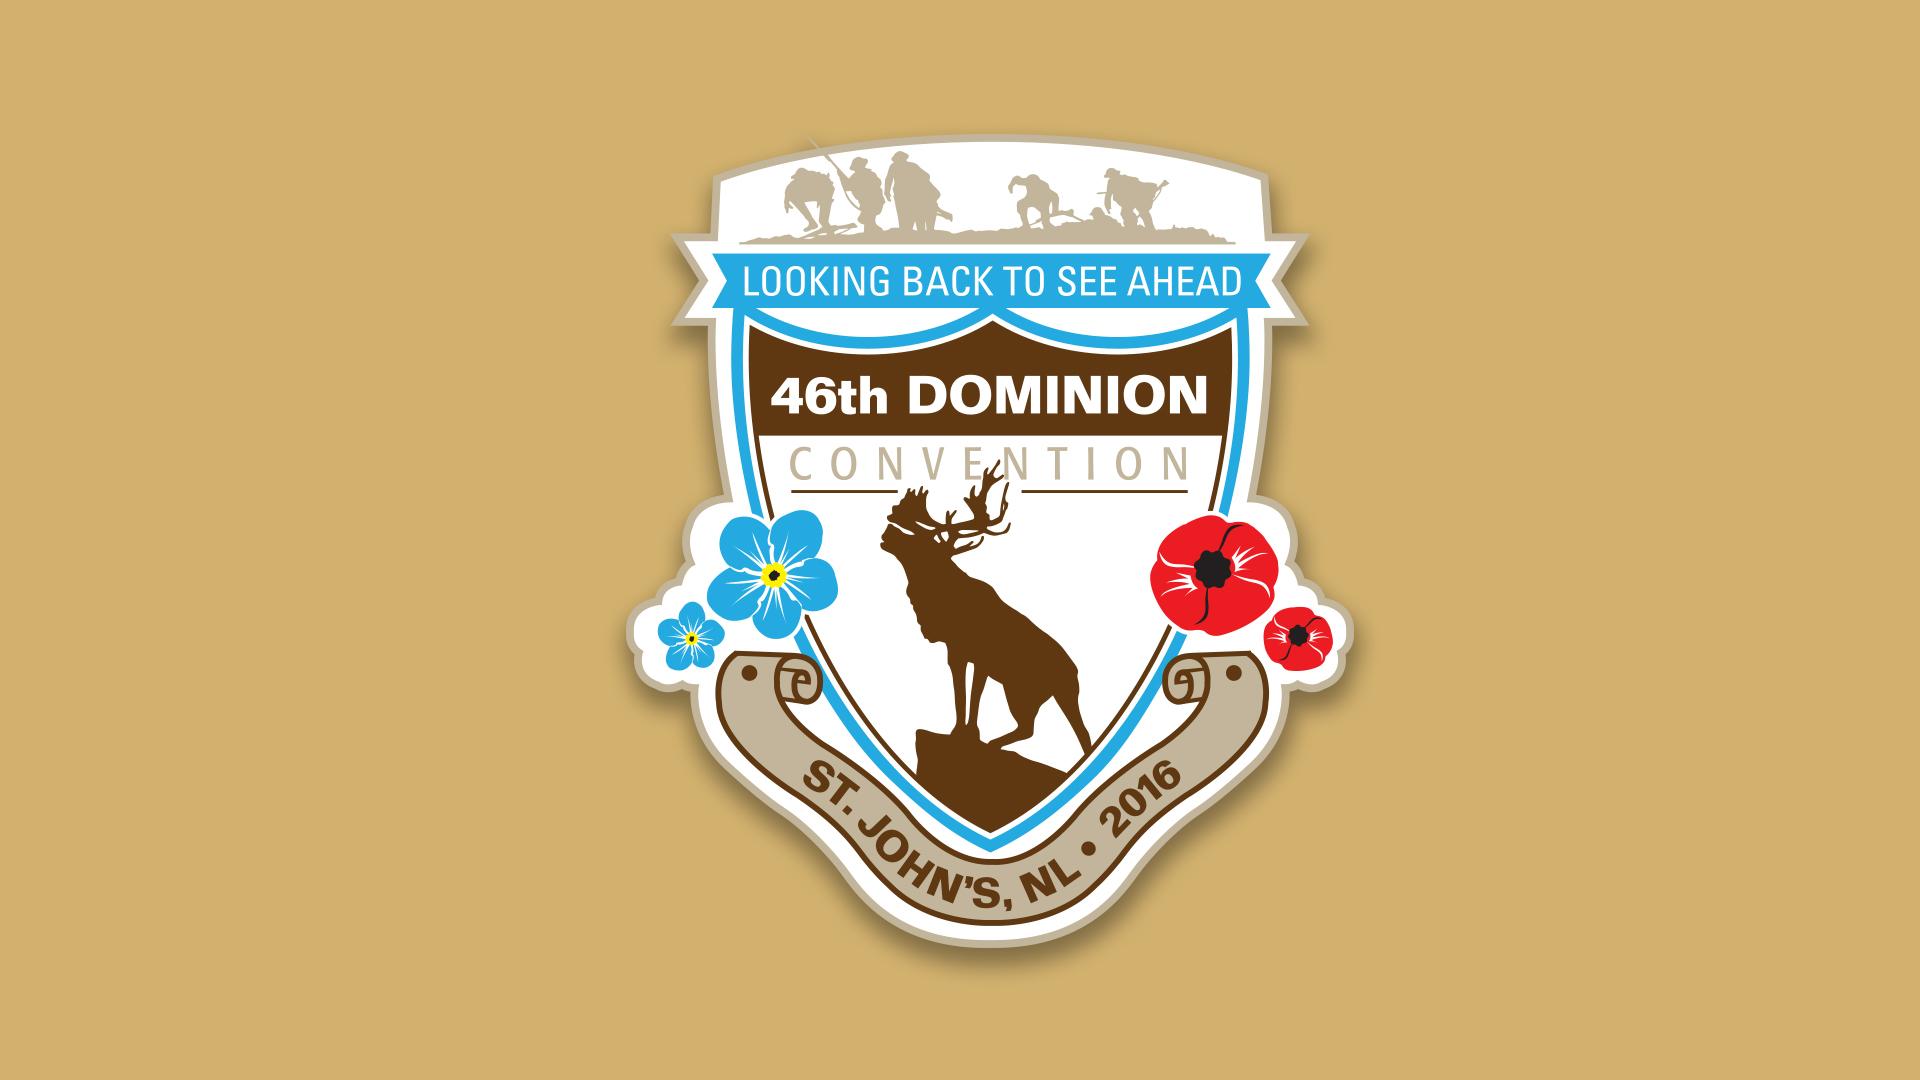 46 Dominion Convention Crest